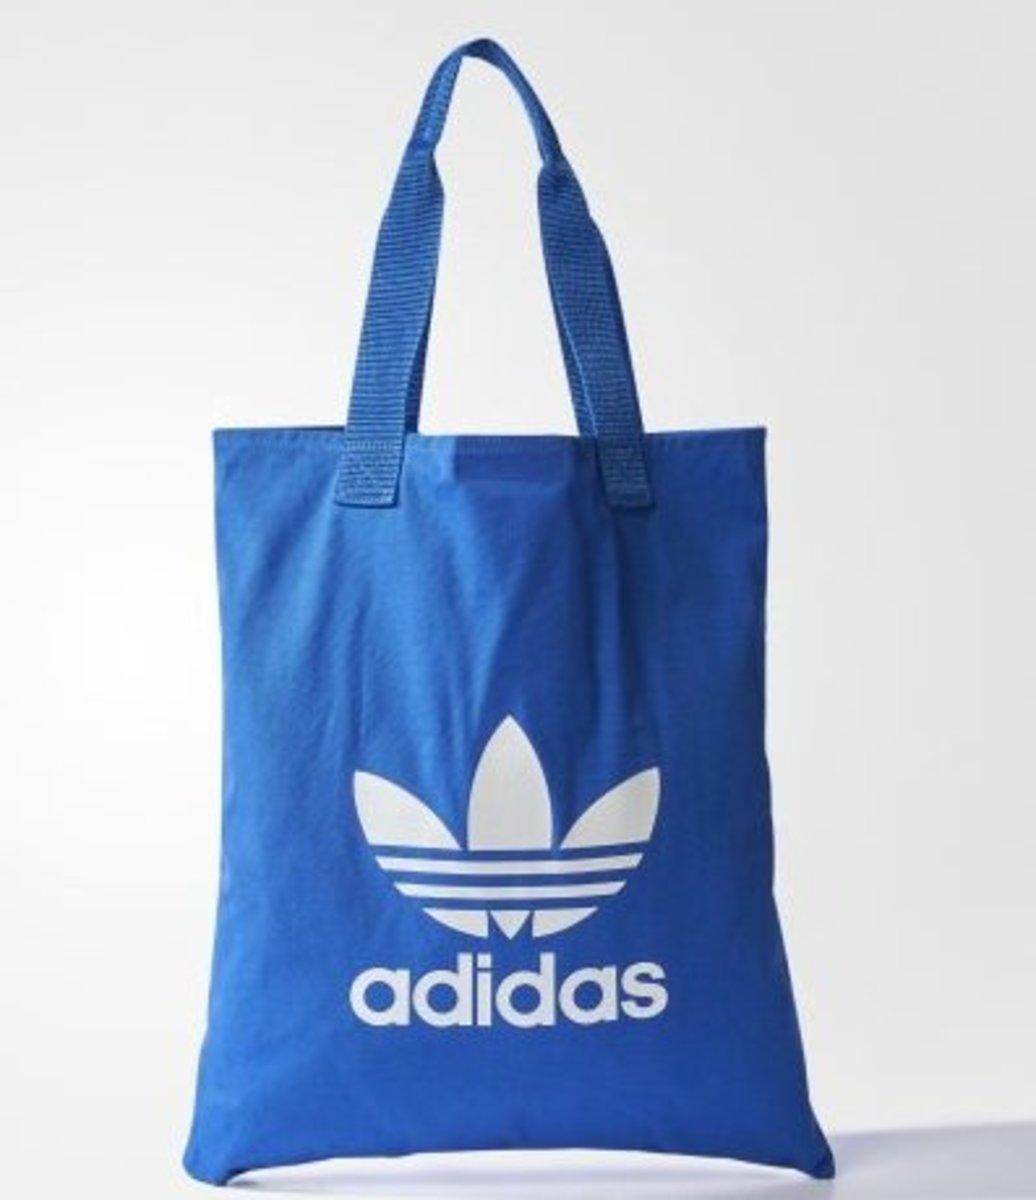 (Blue Tote Bag) Japan❤️adidas Originals Casual Tote Bag in Simplicity Style